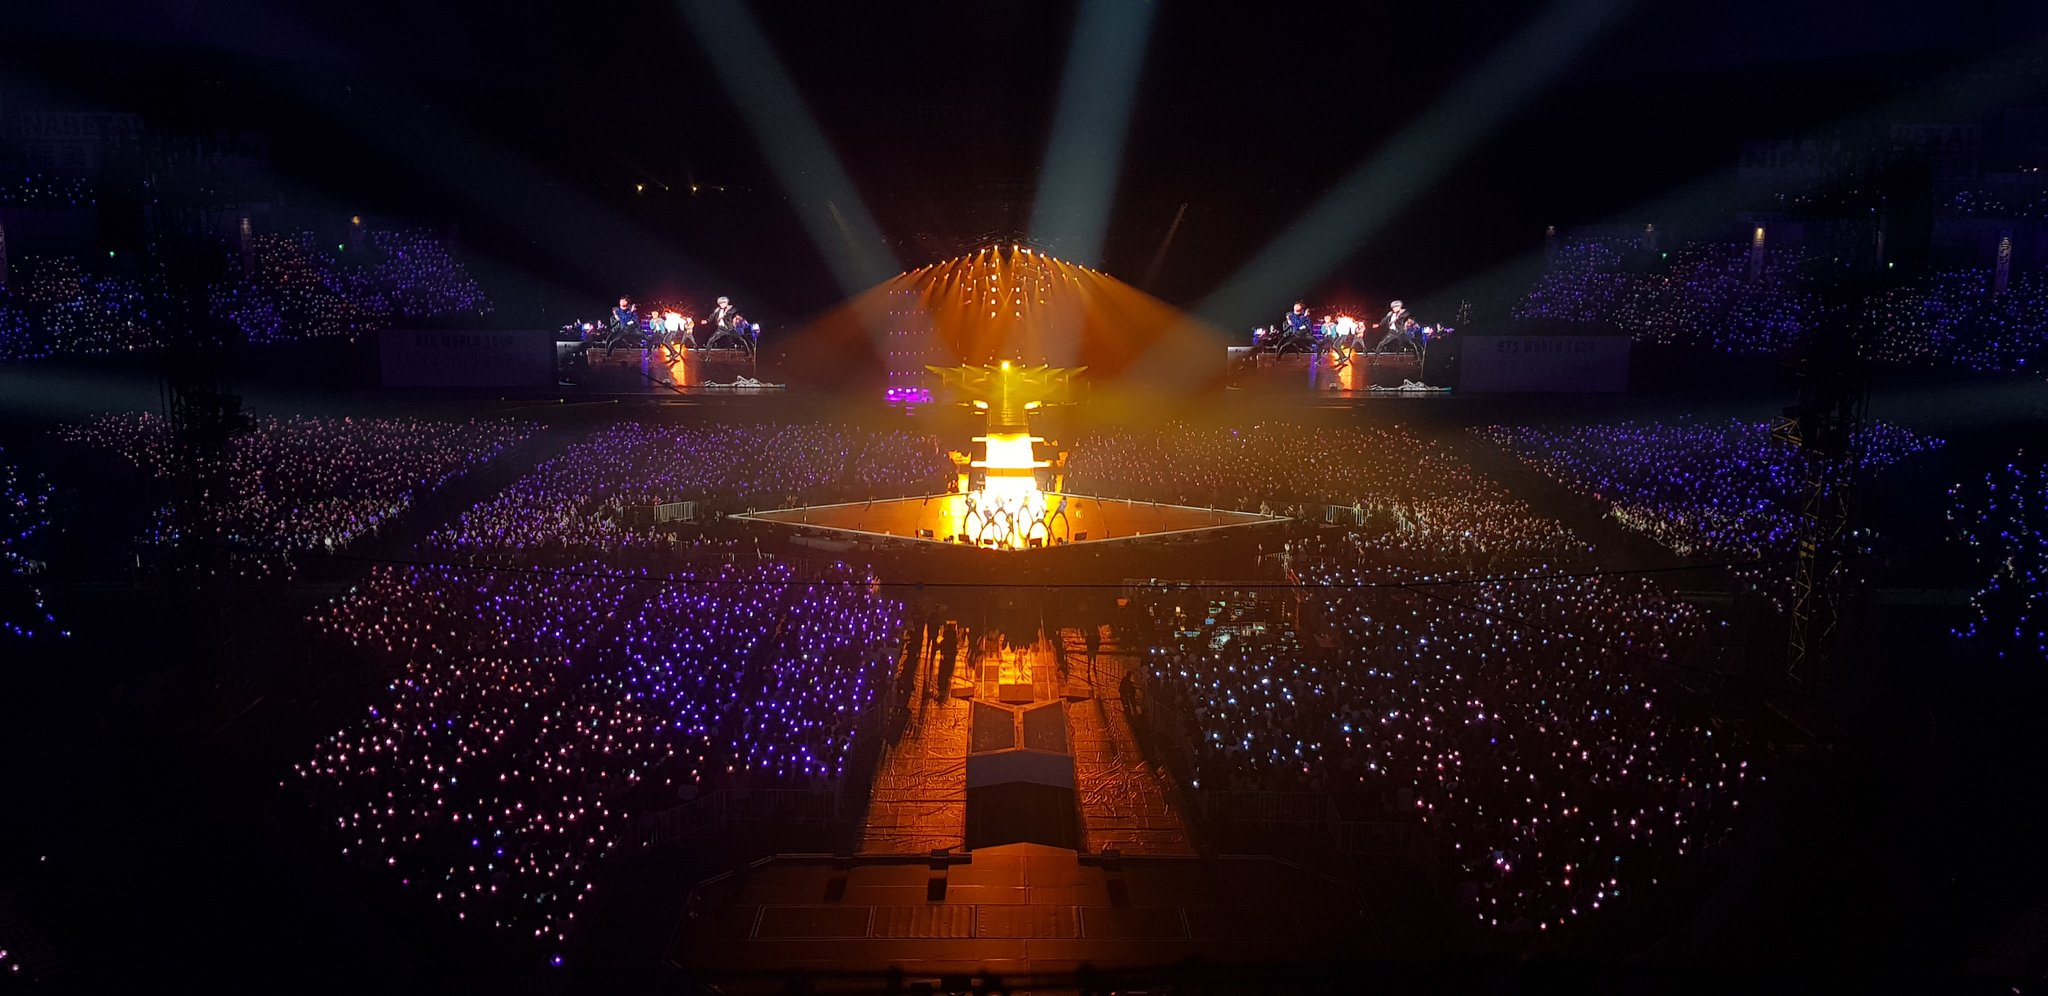 bts, bts profile, bts facts, bts members, bts age, bts height, bts comeback, bts boy with luv, bts leader, bts comeback, bts jin, jin, seokjin,